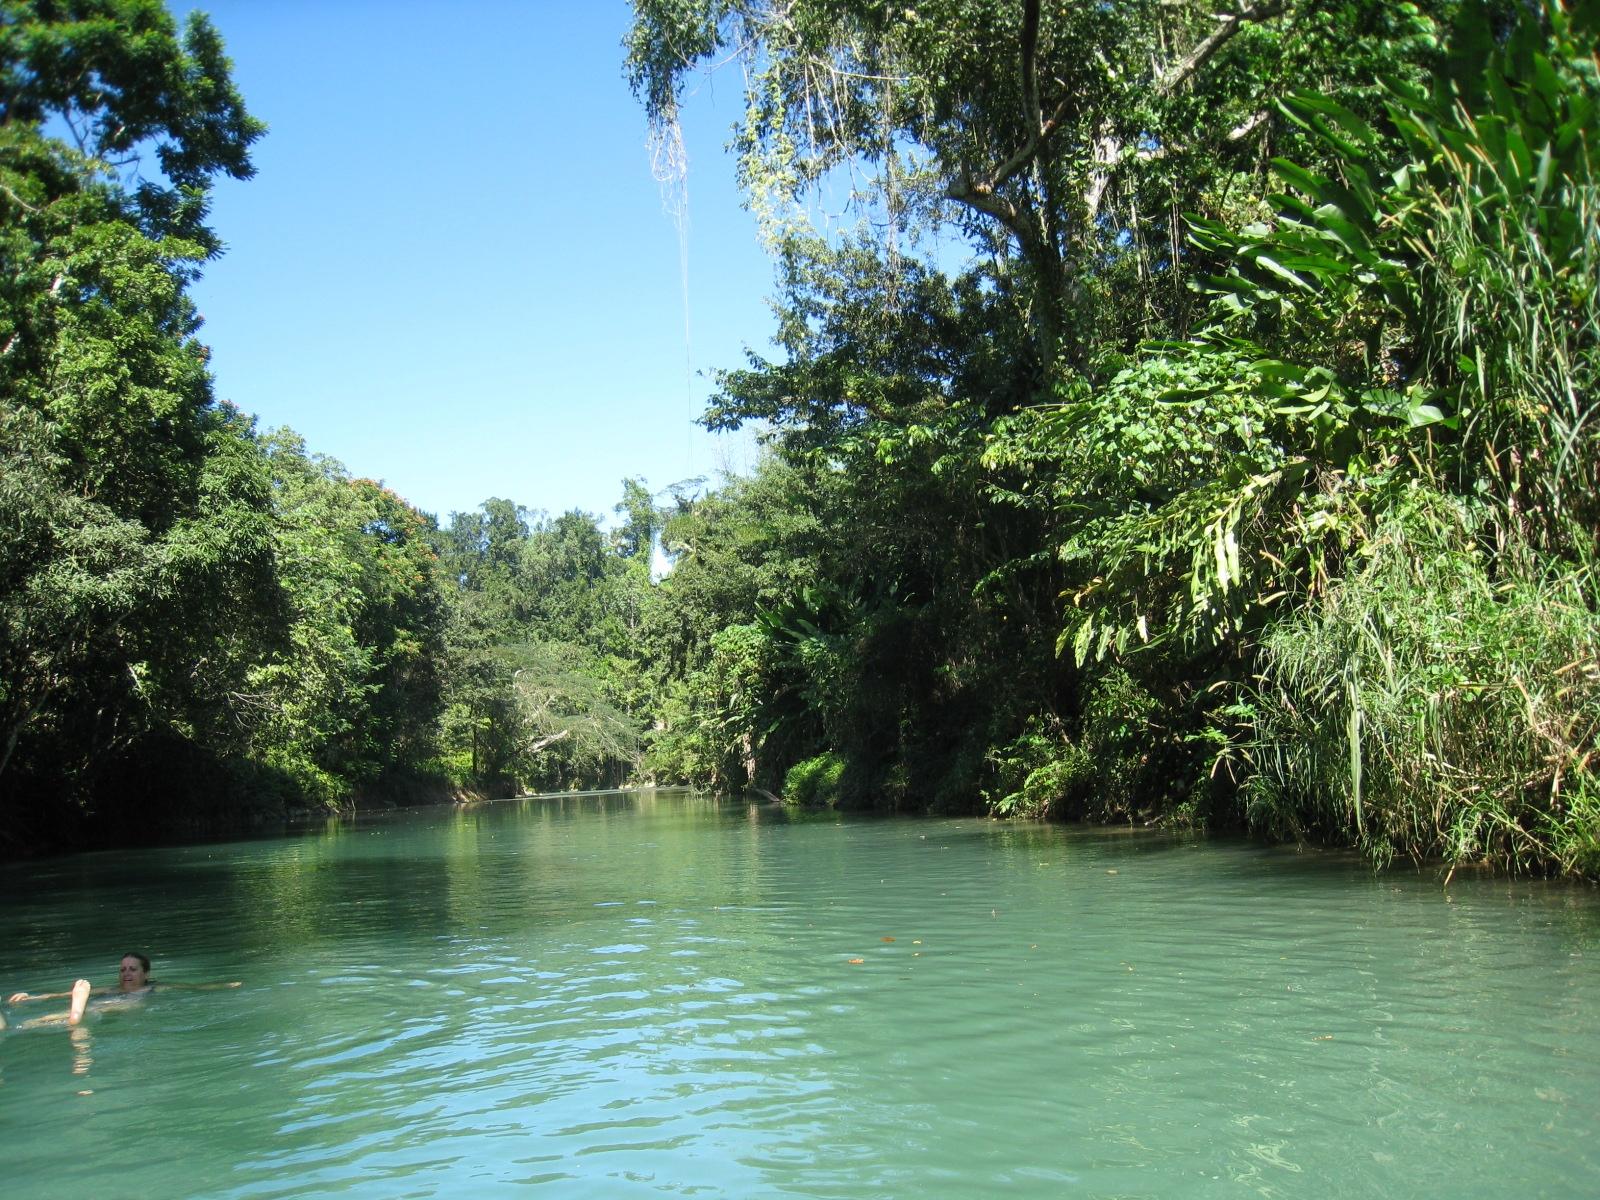 Jamaica Rio Grande River - just beautiful